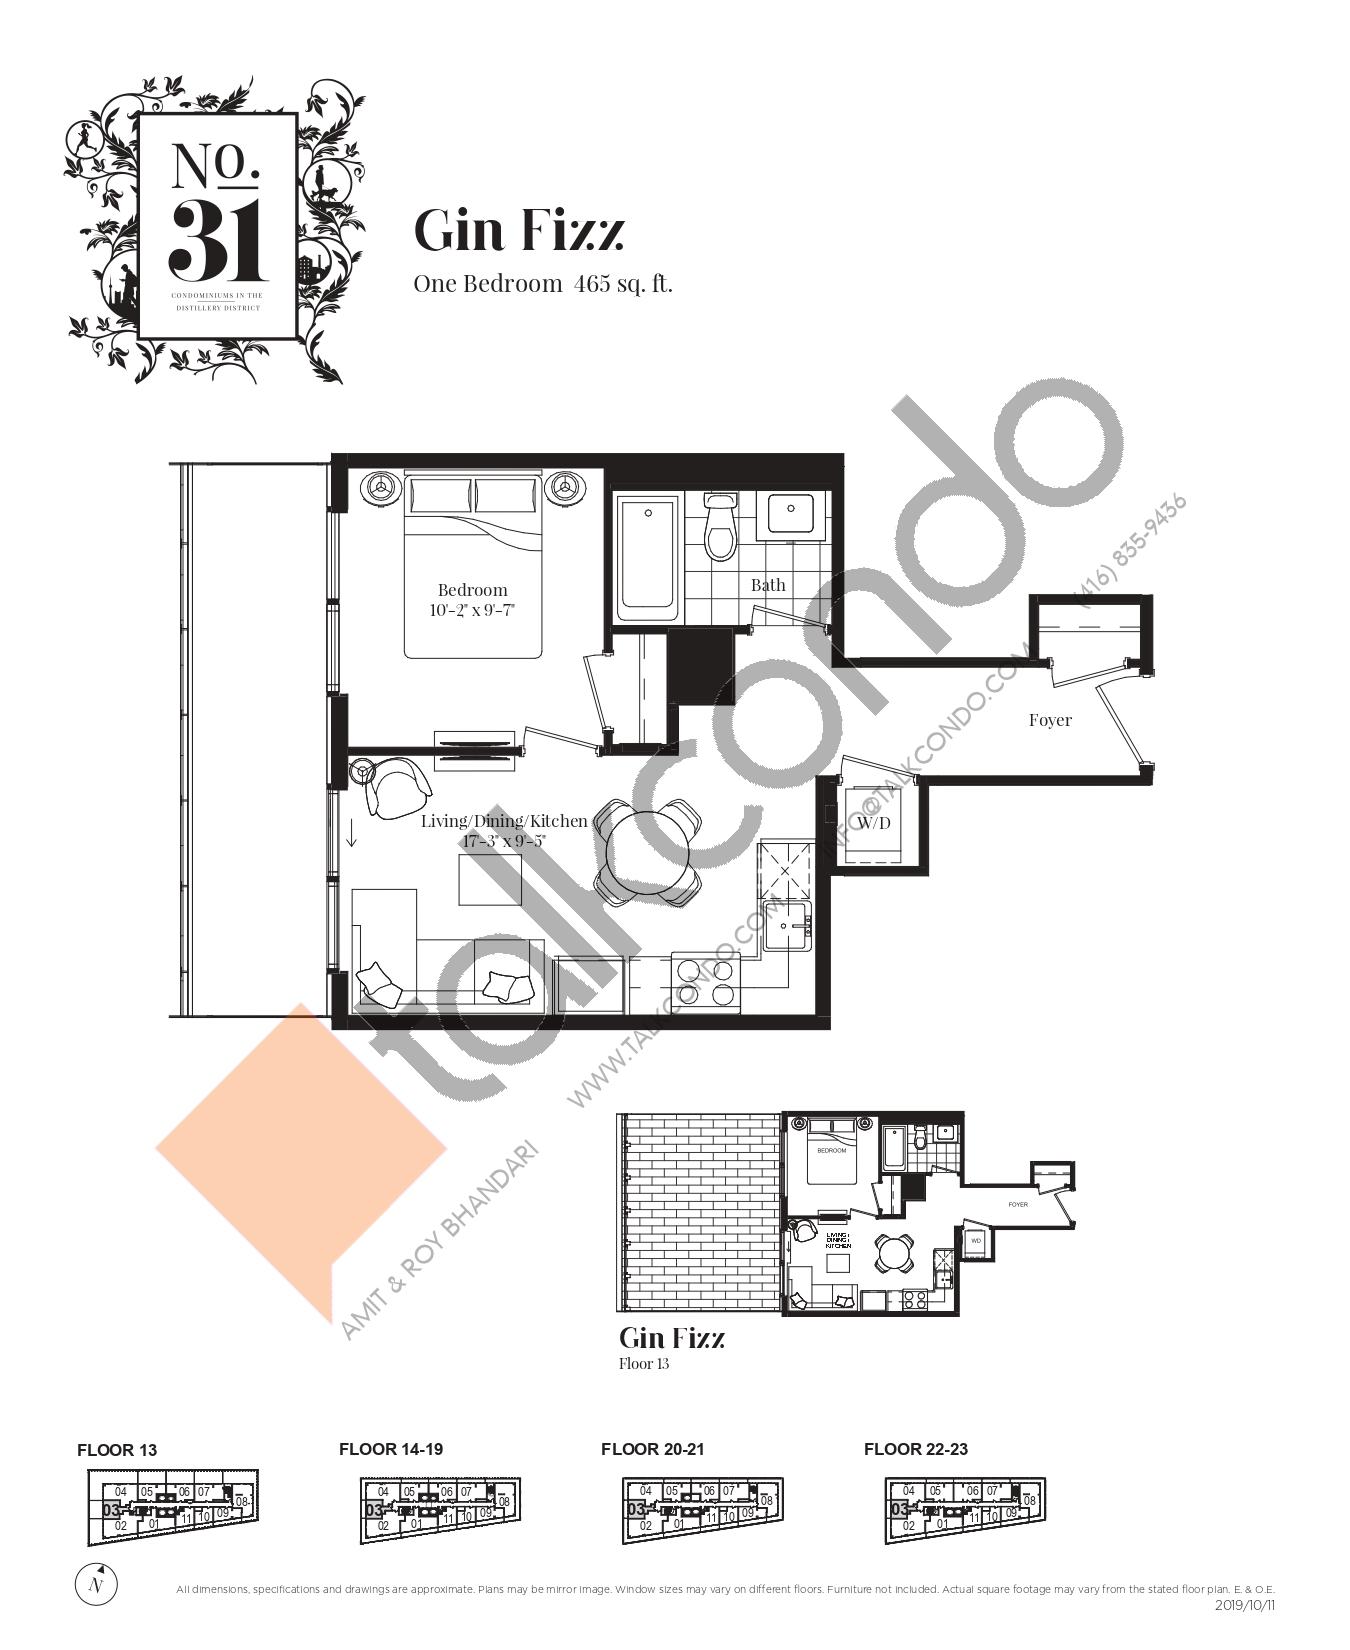 Gin Fizz Floor Plan at No. 31 Condos - 465 sq.ft